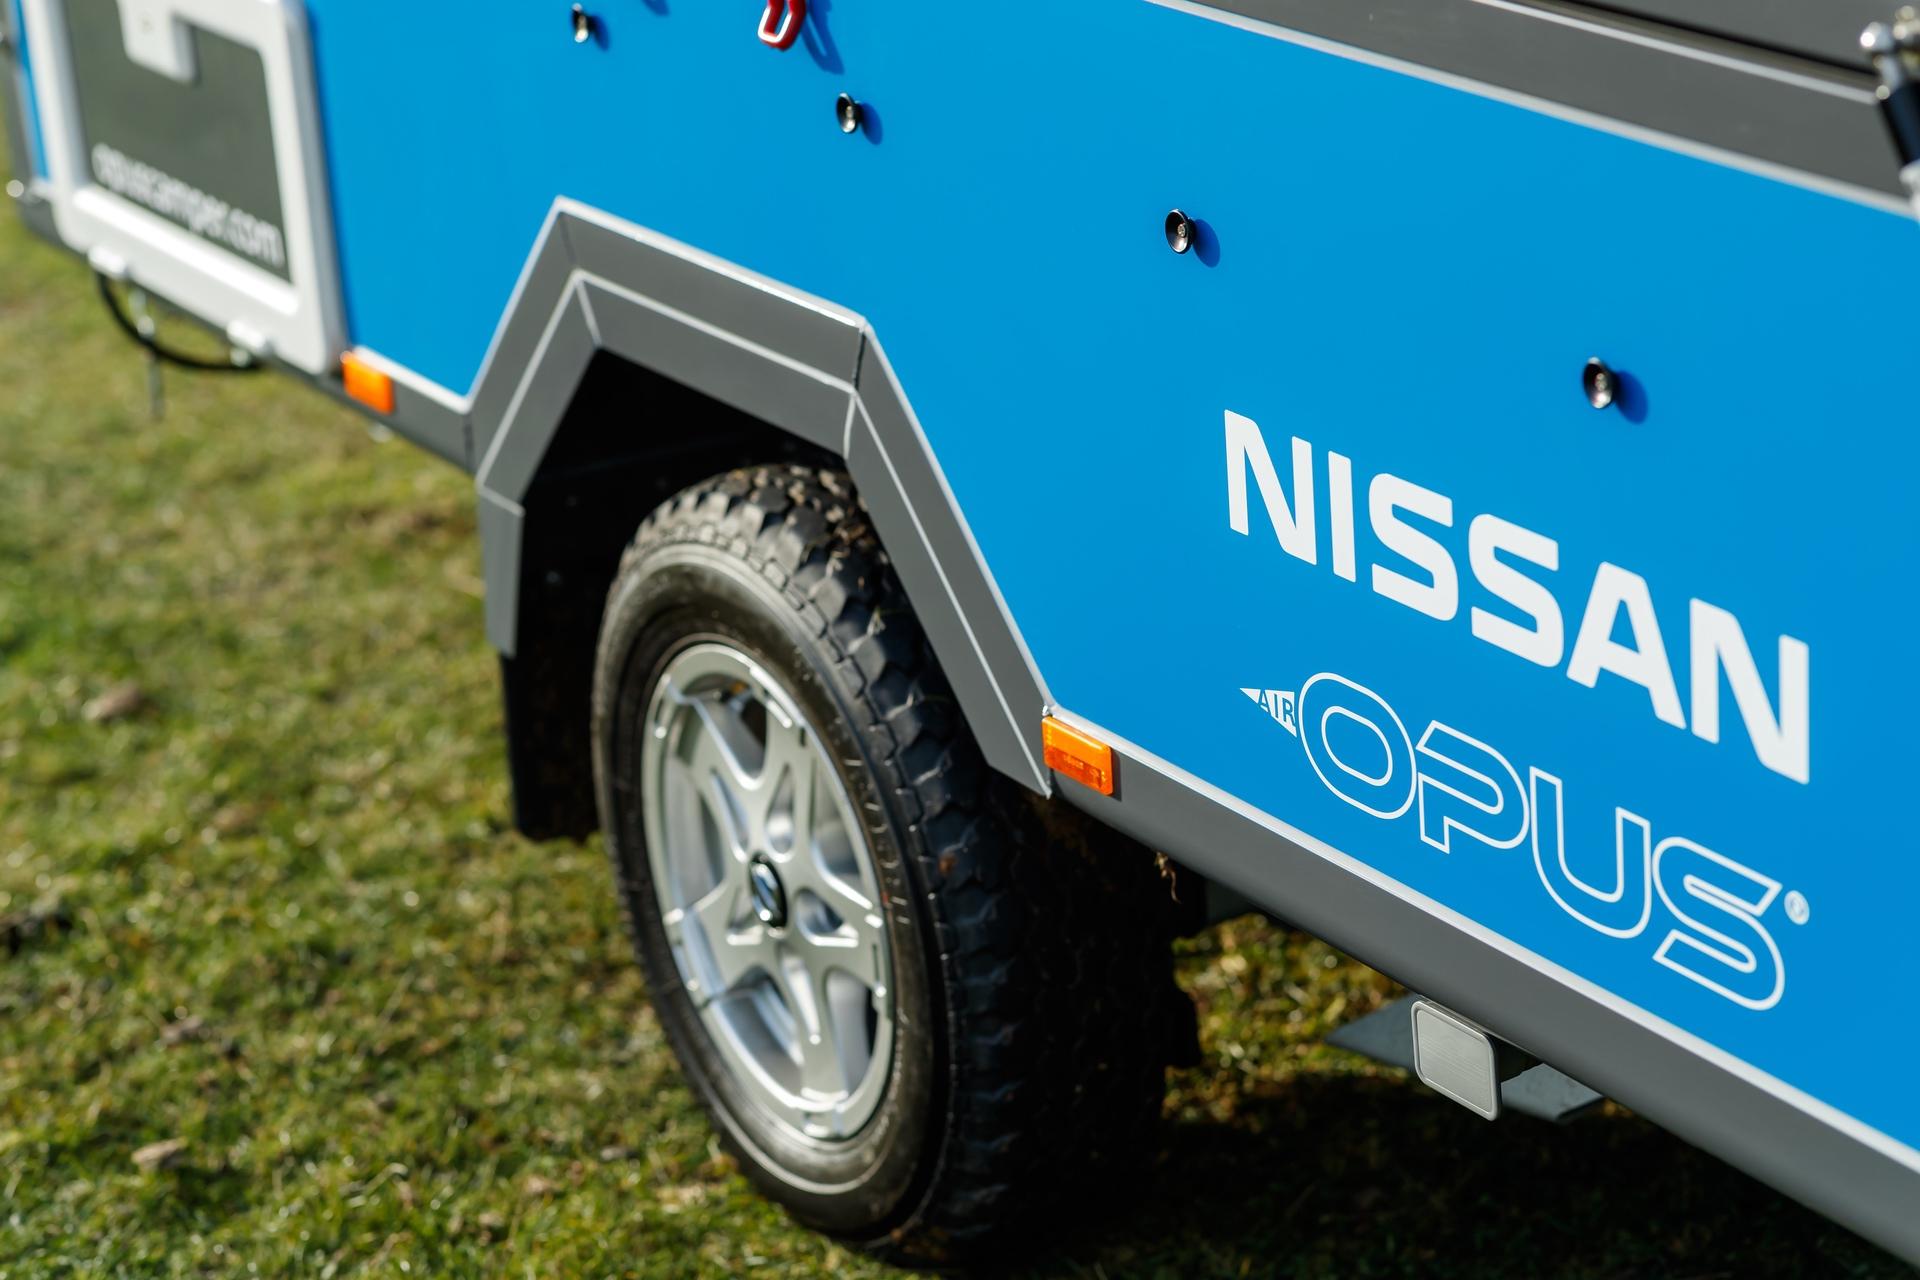 Nissan_AirOPUS_051